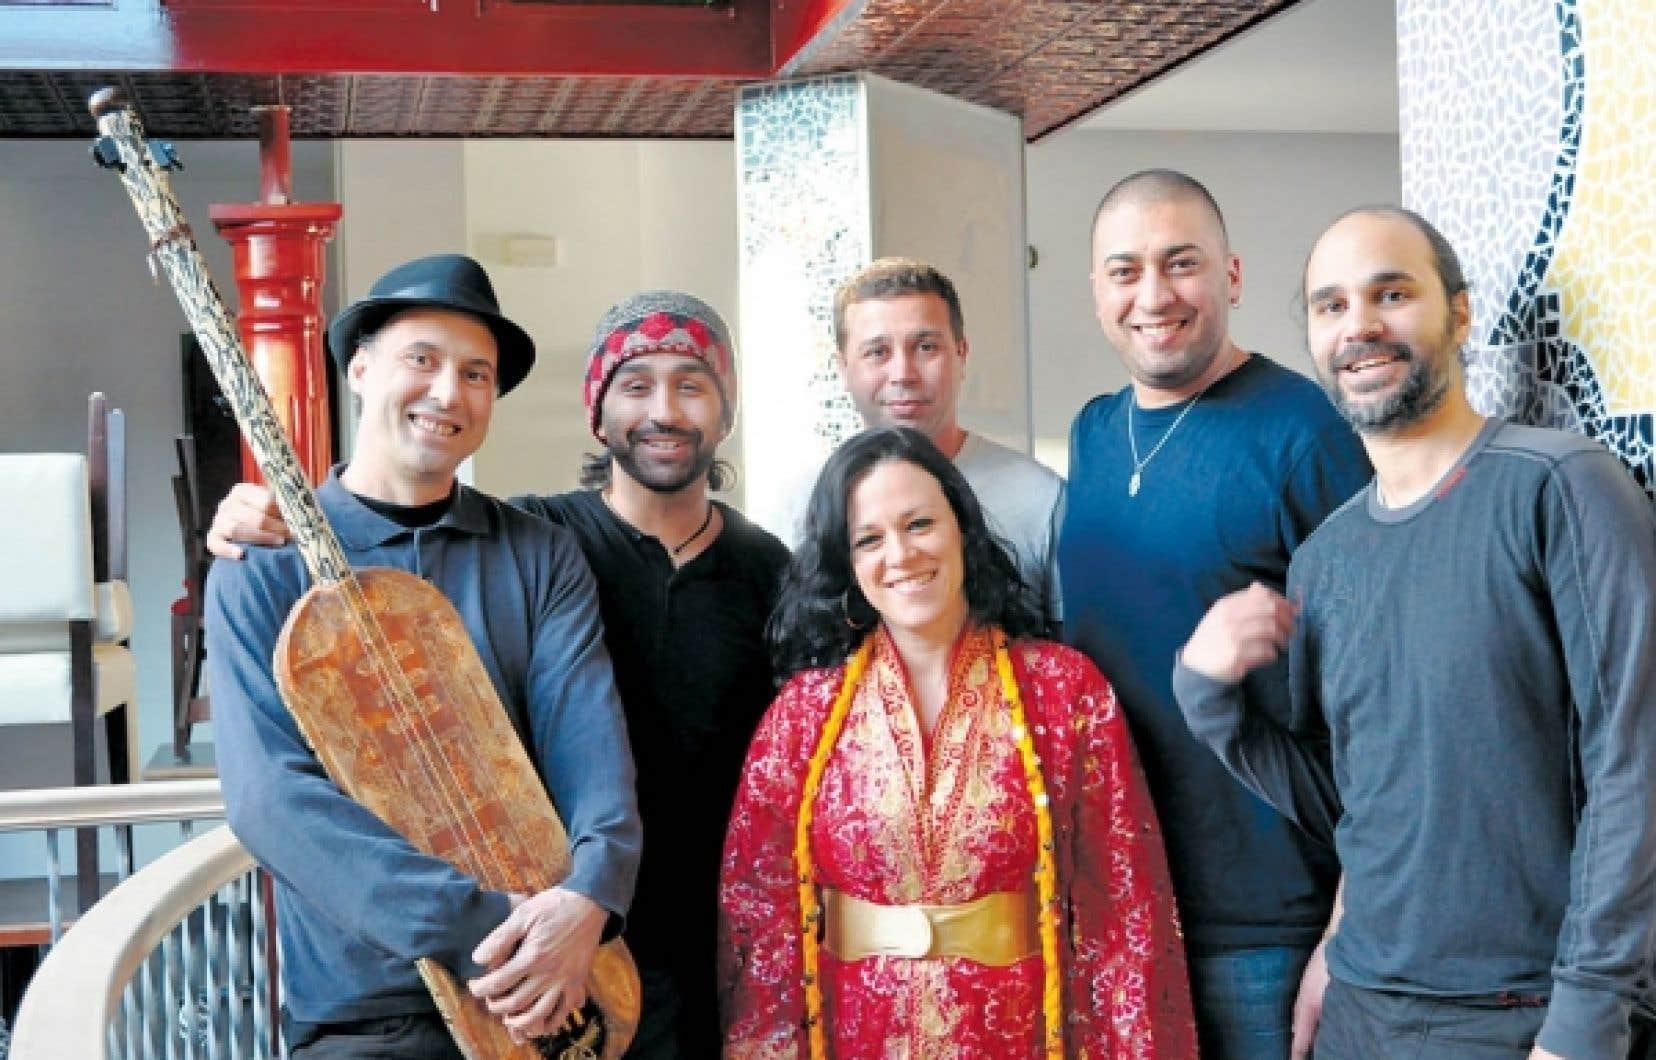 De gauche &agrave; droite: Nazir Bouchareb, Khalil Abouabdelmajid, Samanta Burnstein, Mohamed Masmoudi, Karim Benza&iuml;d et Zied Ben Amor.<br />